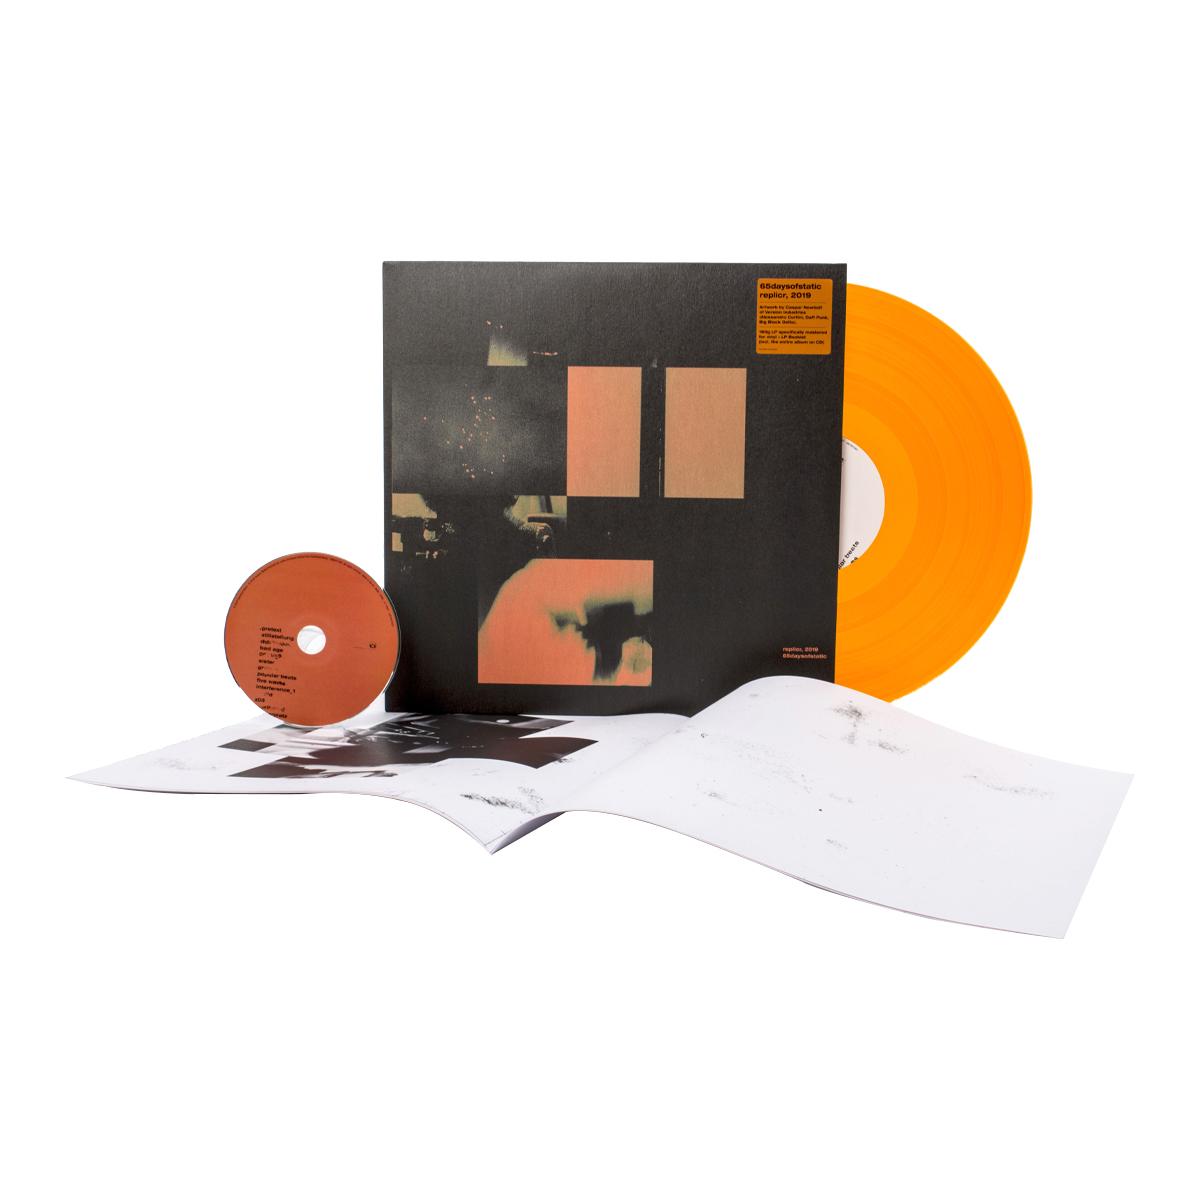 65daysofstatic - replicr, 2019 Transparent Orange Vinyl LP + CD